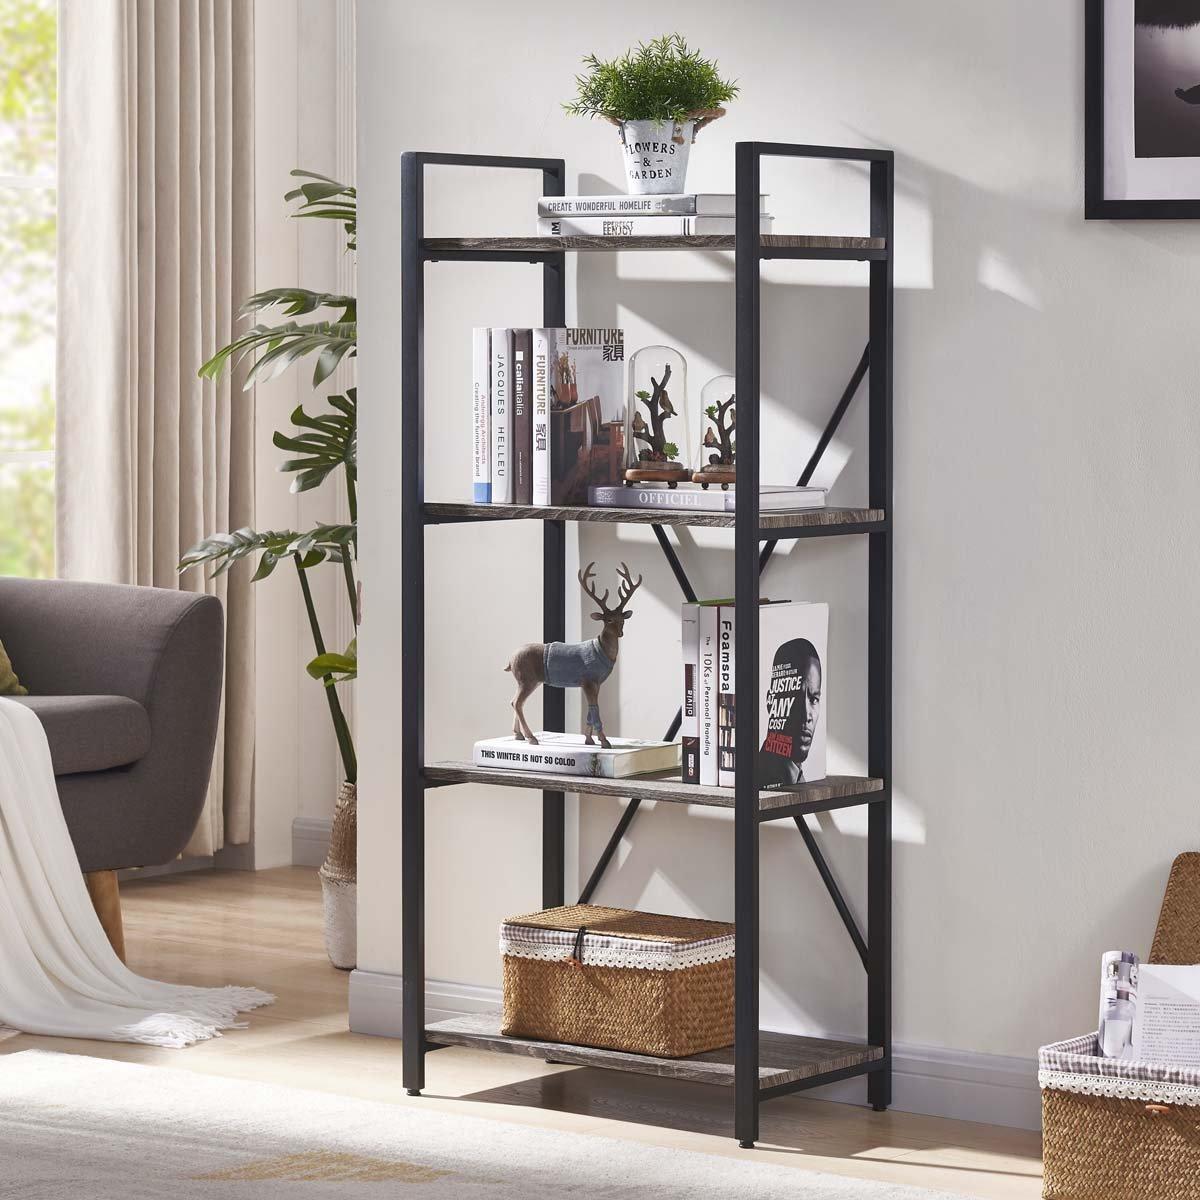 BON AUGURE 4-Shelf Open Narrow Bookshelf, Vintage Industrial Bookcase, Rustic Wood and Metal Shelf, Dark Oak